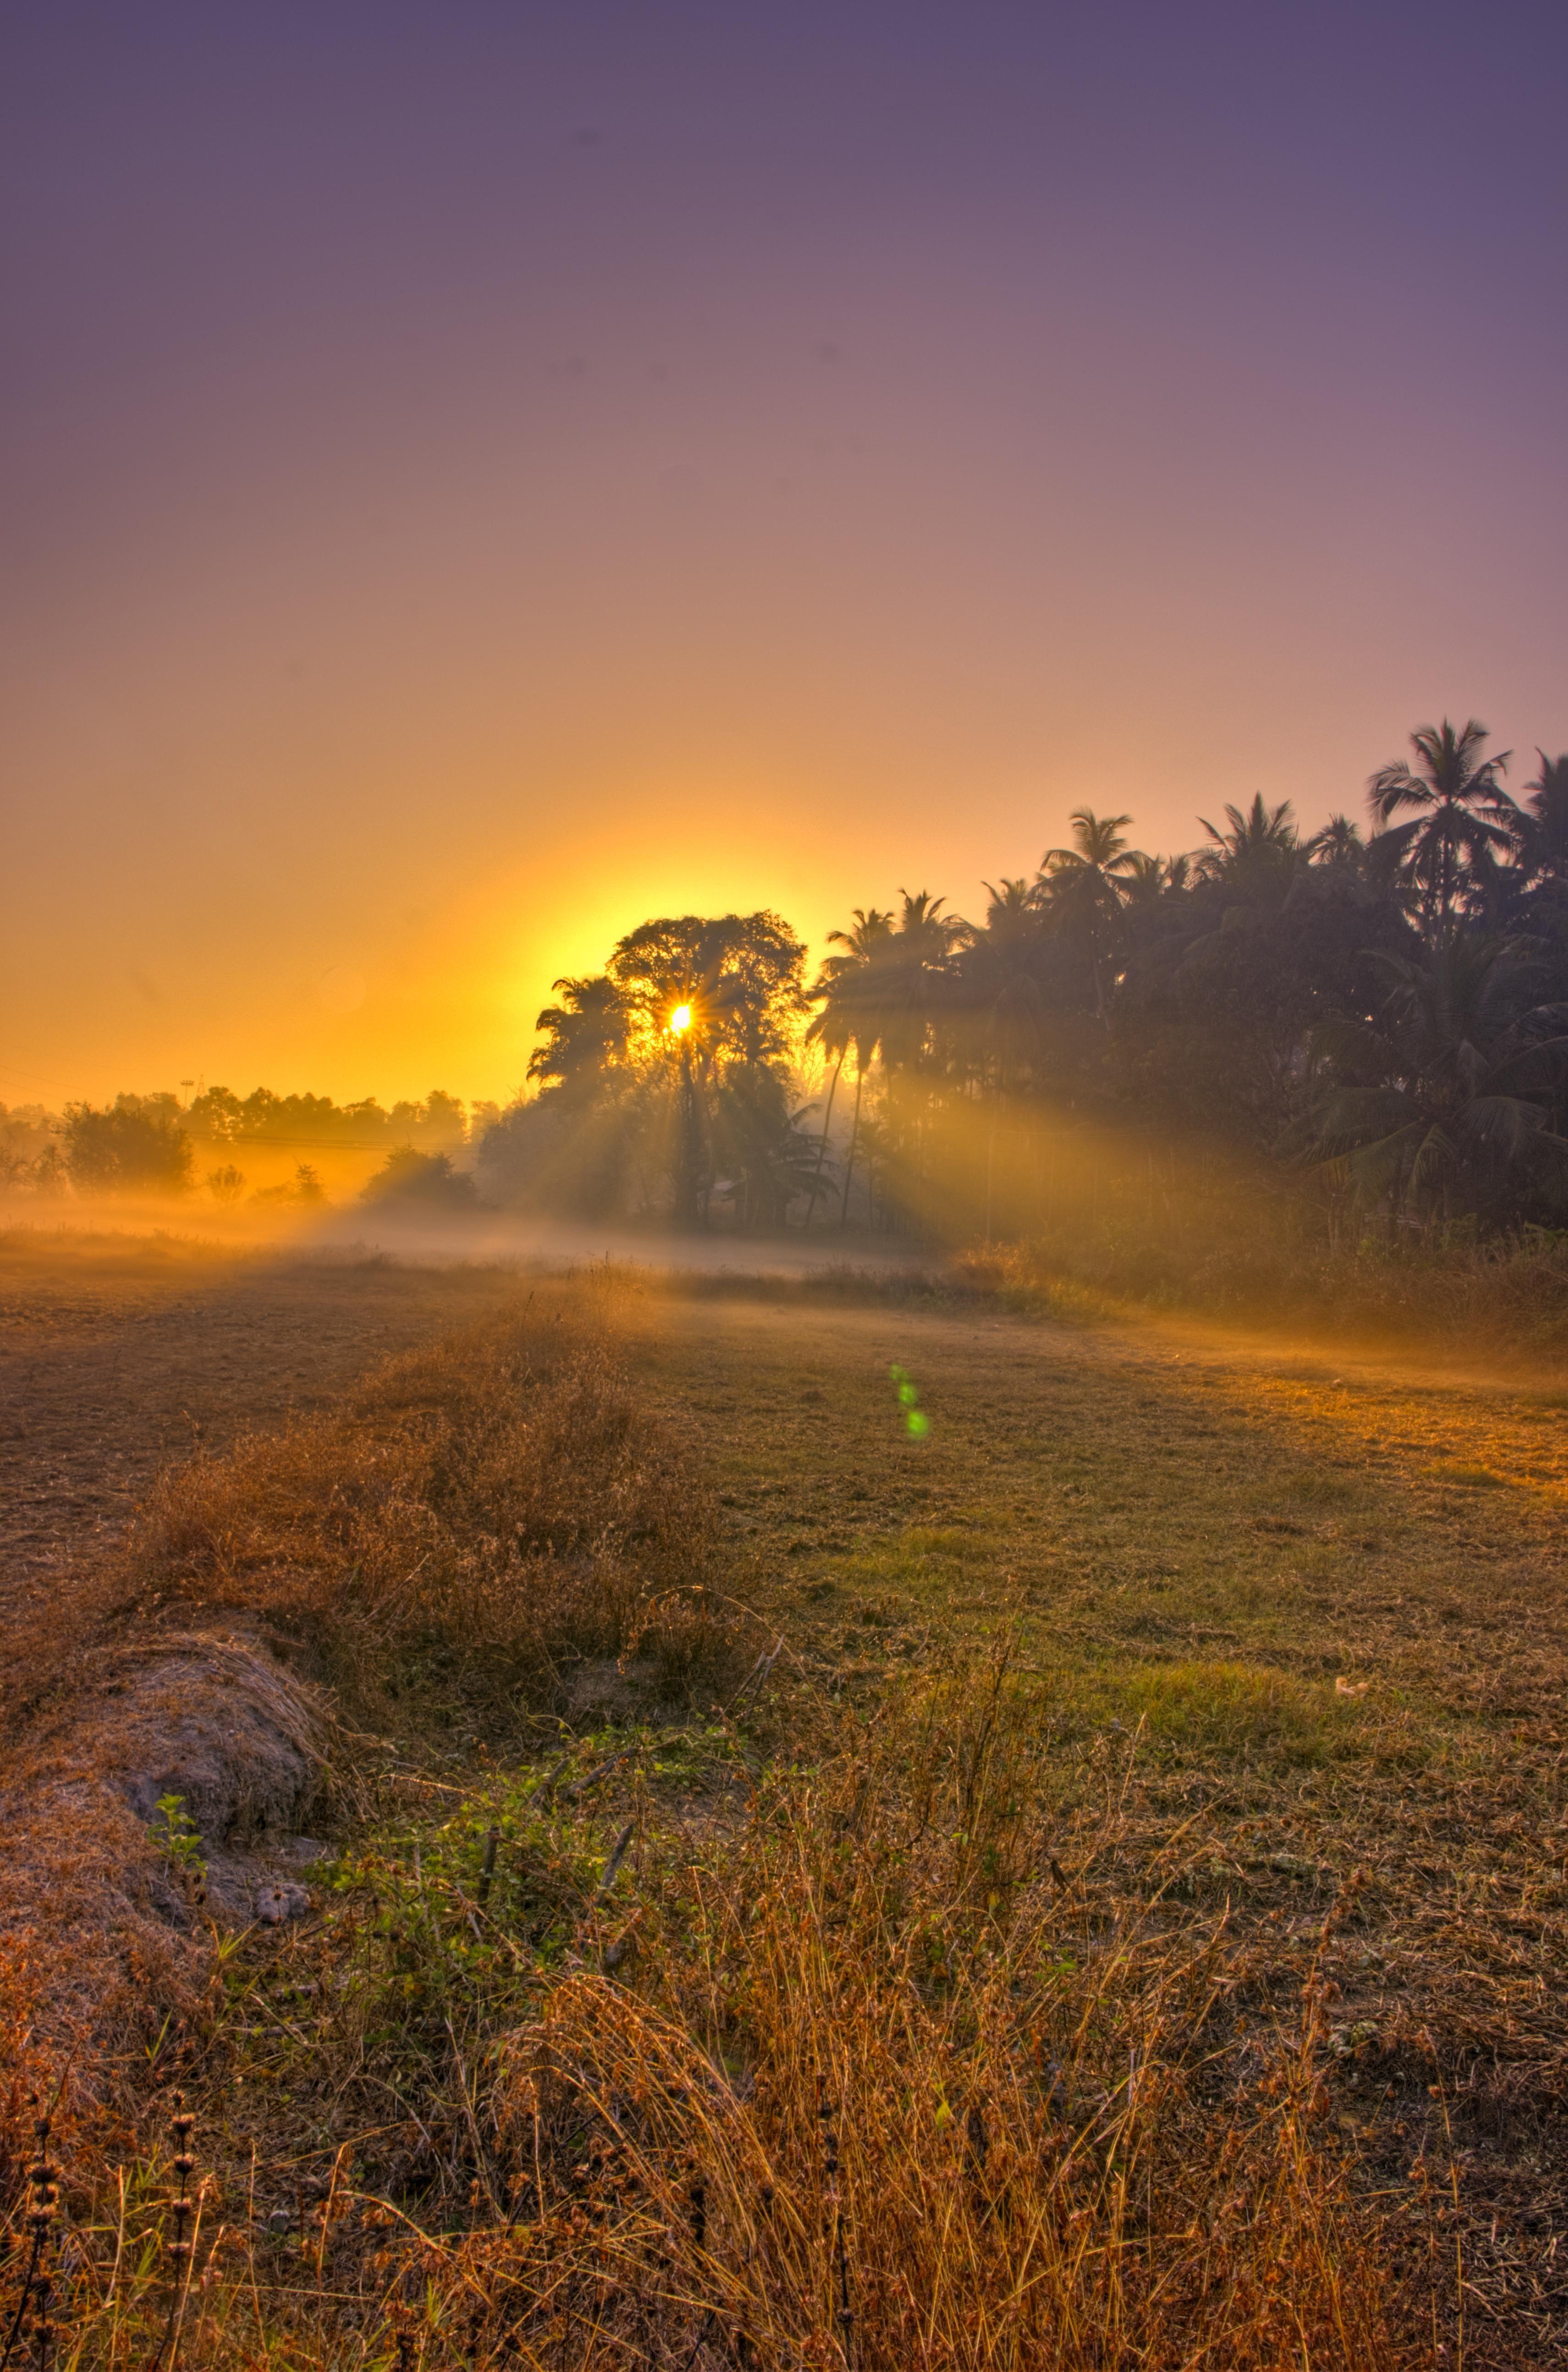 Sunrise At Padoor Village Udupi India Oc 3422x5175 Http Bit Ly 2p2nuum Beautiful Images Nature Beautiful Nature Cool Landscapes